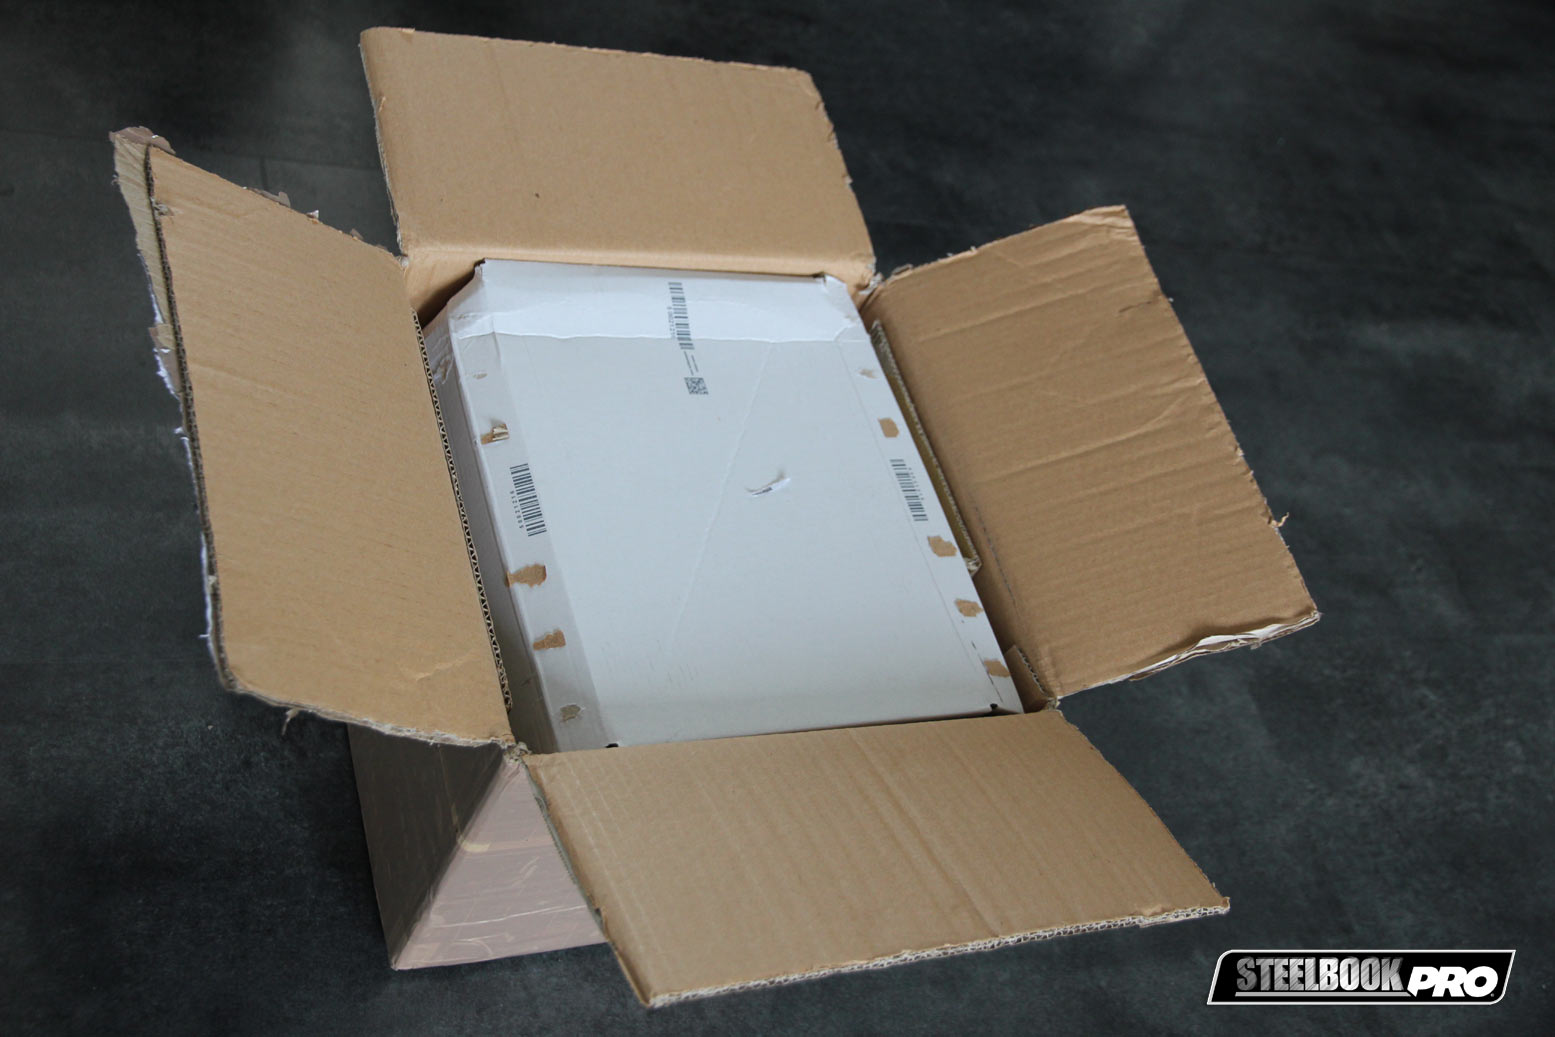 Best-colis-steelbook-2